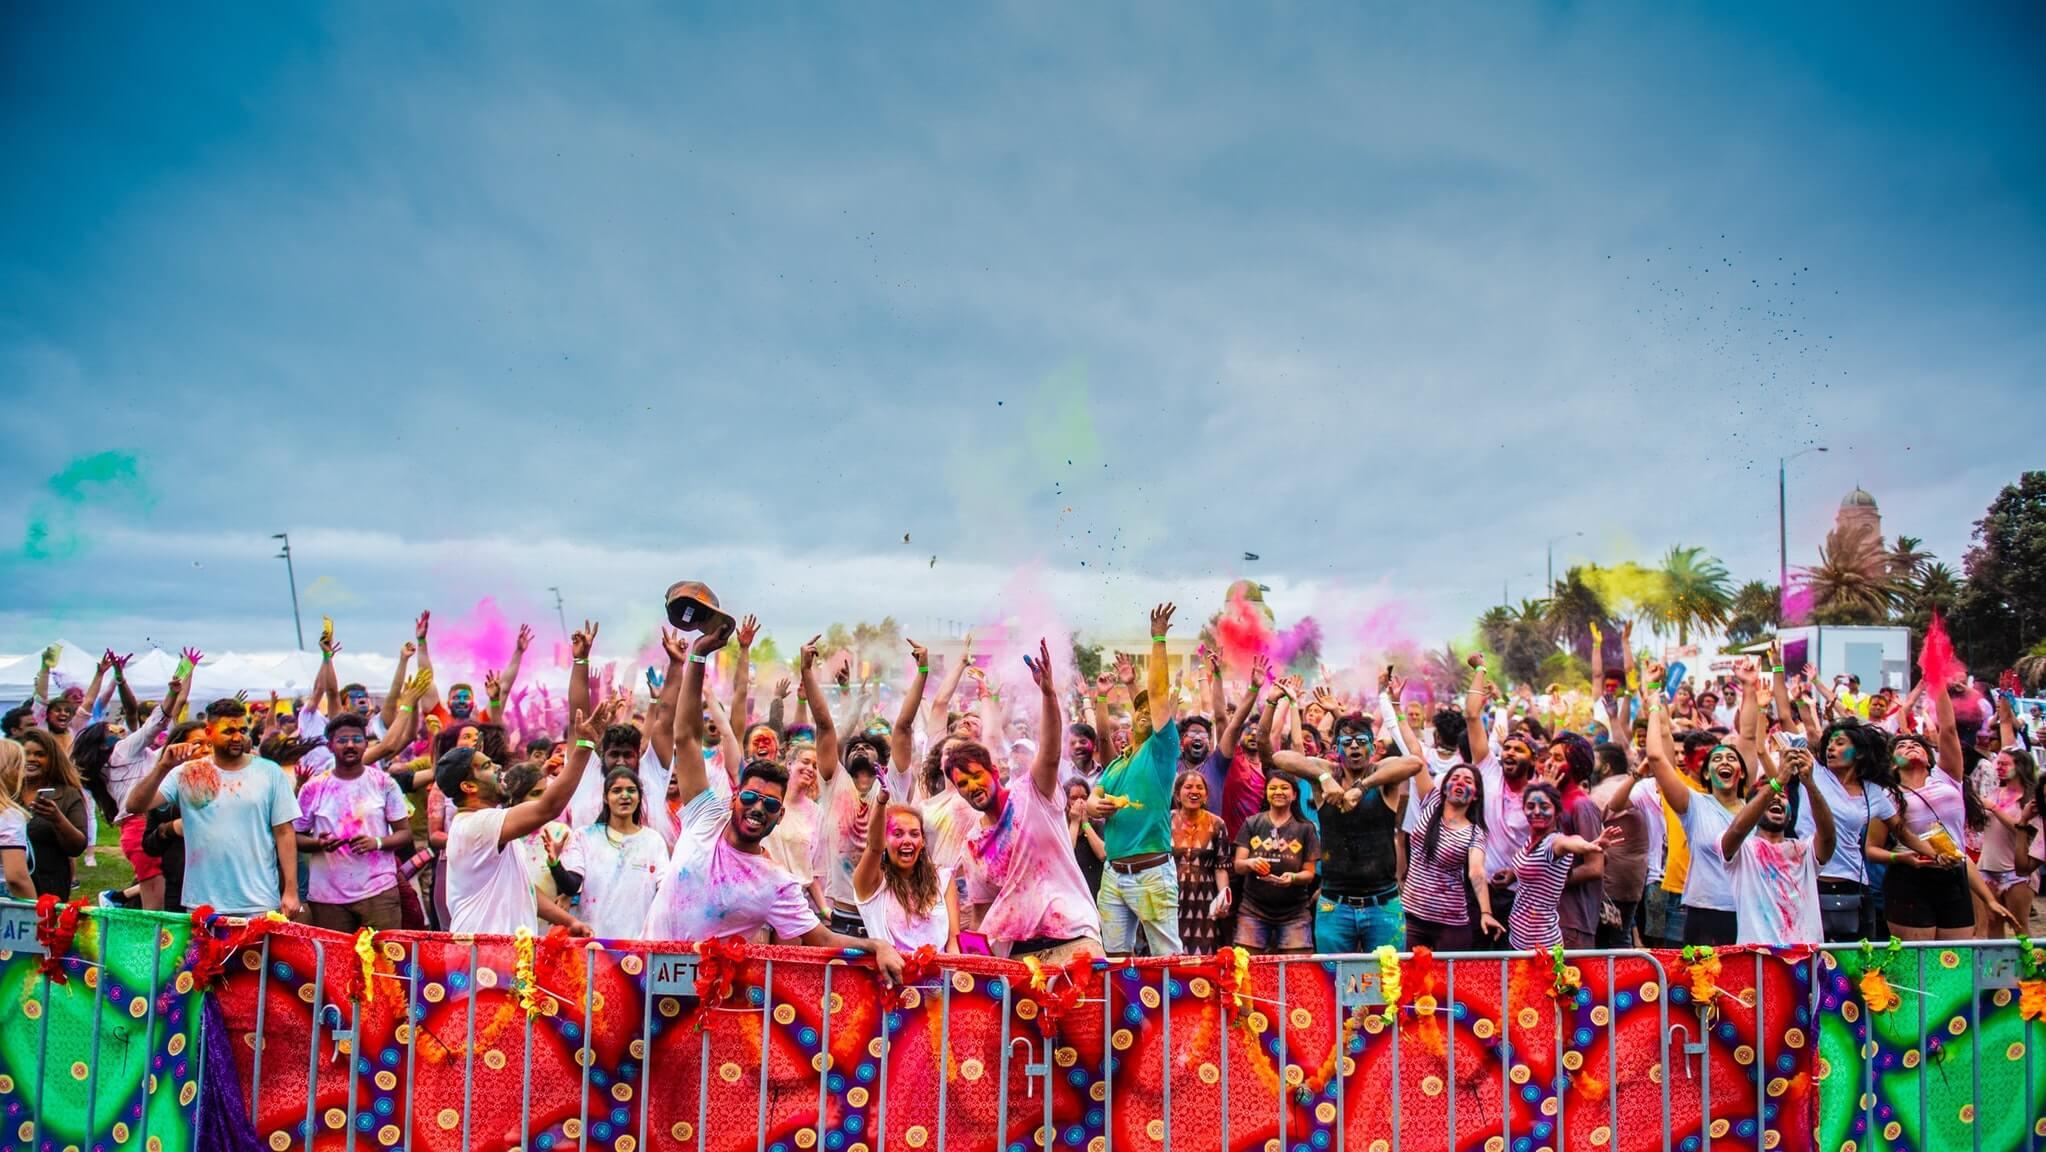 Holi festival in Melbourne